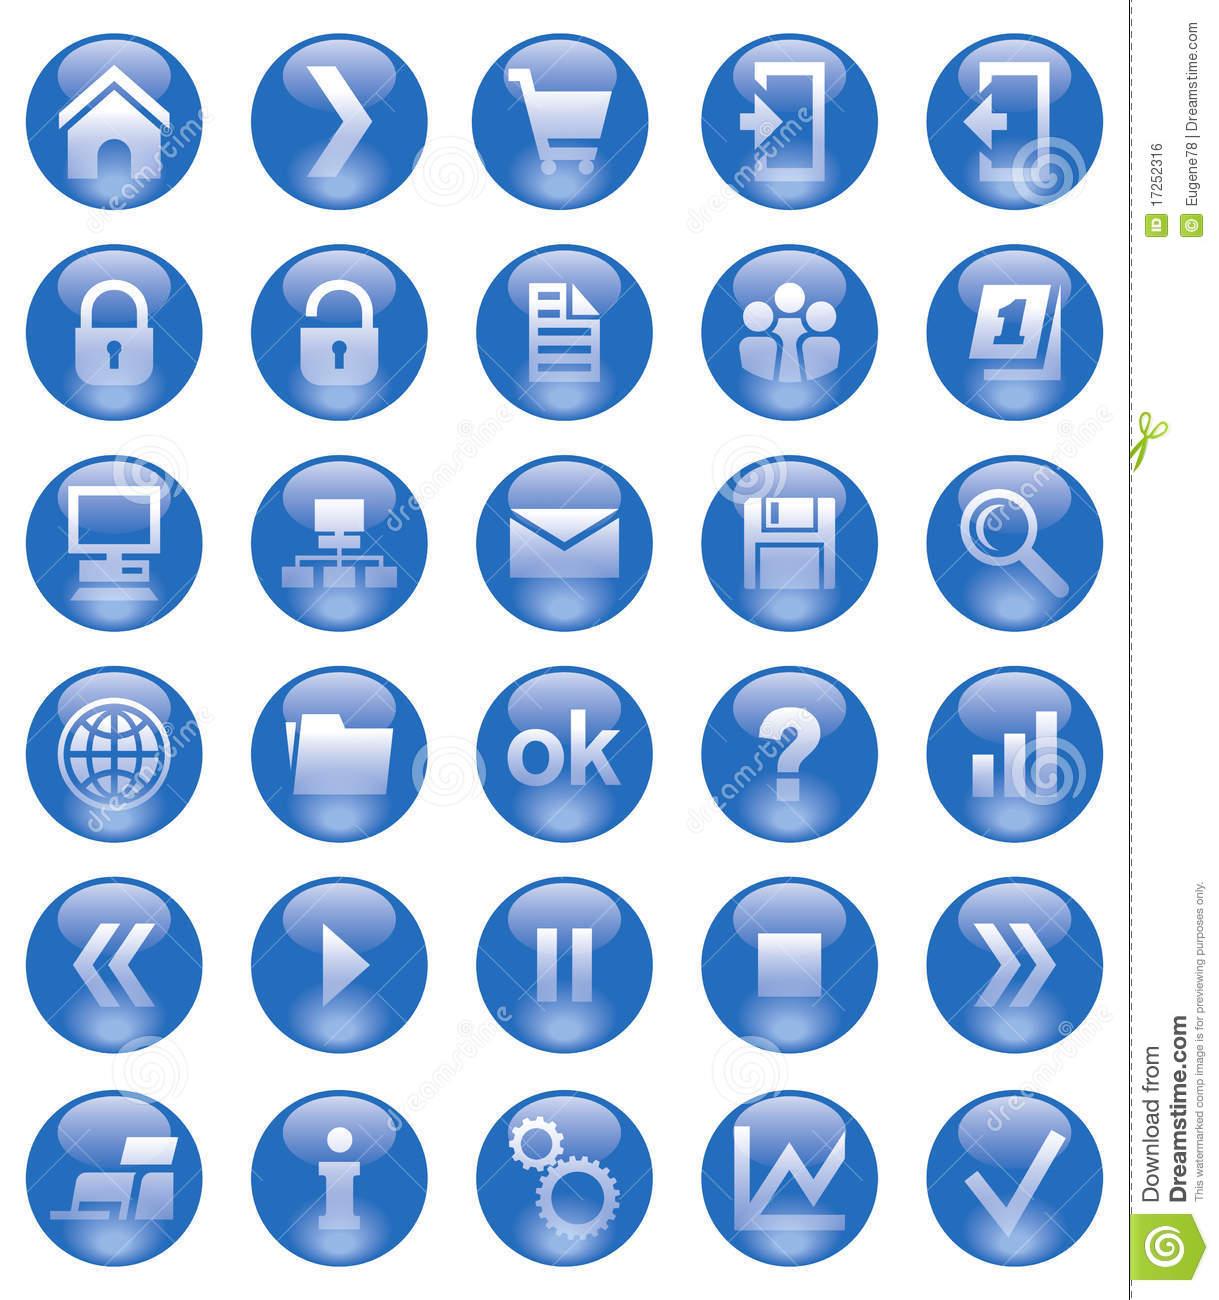 Best Free Web Icons